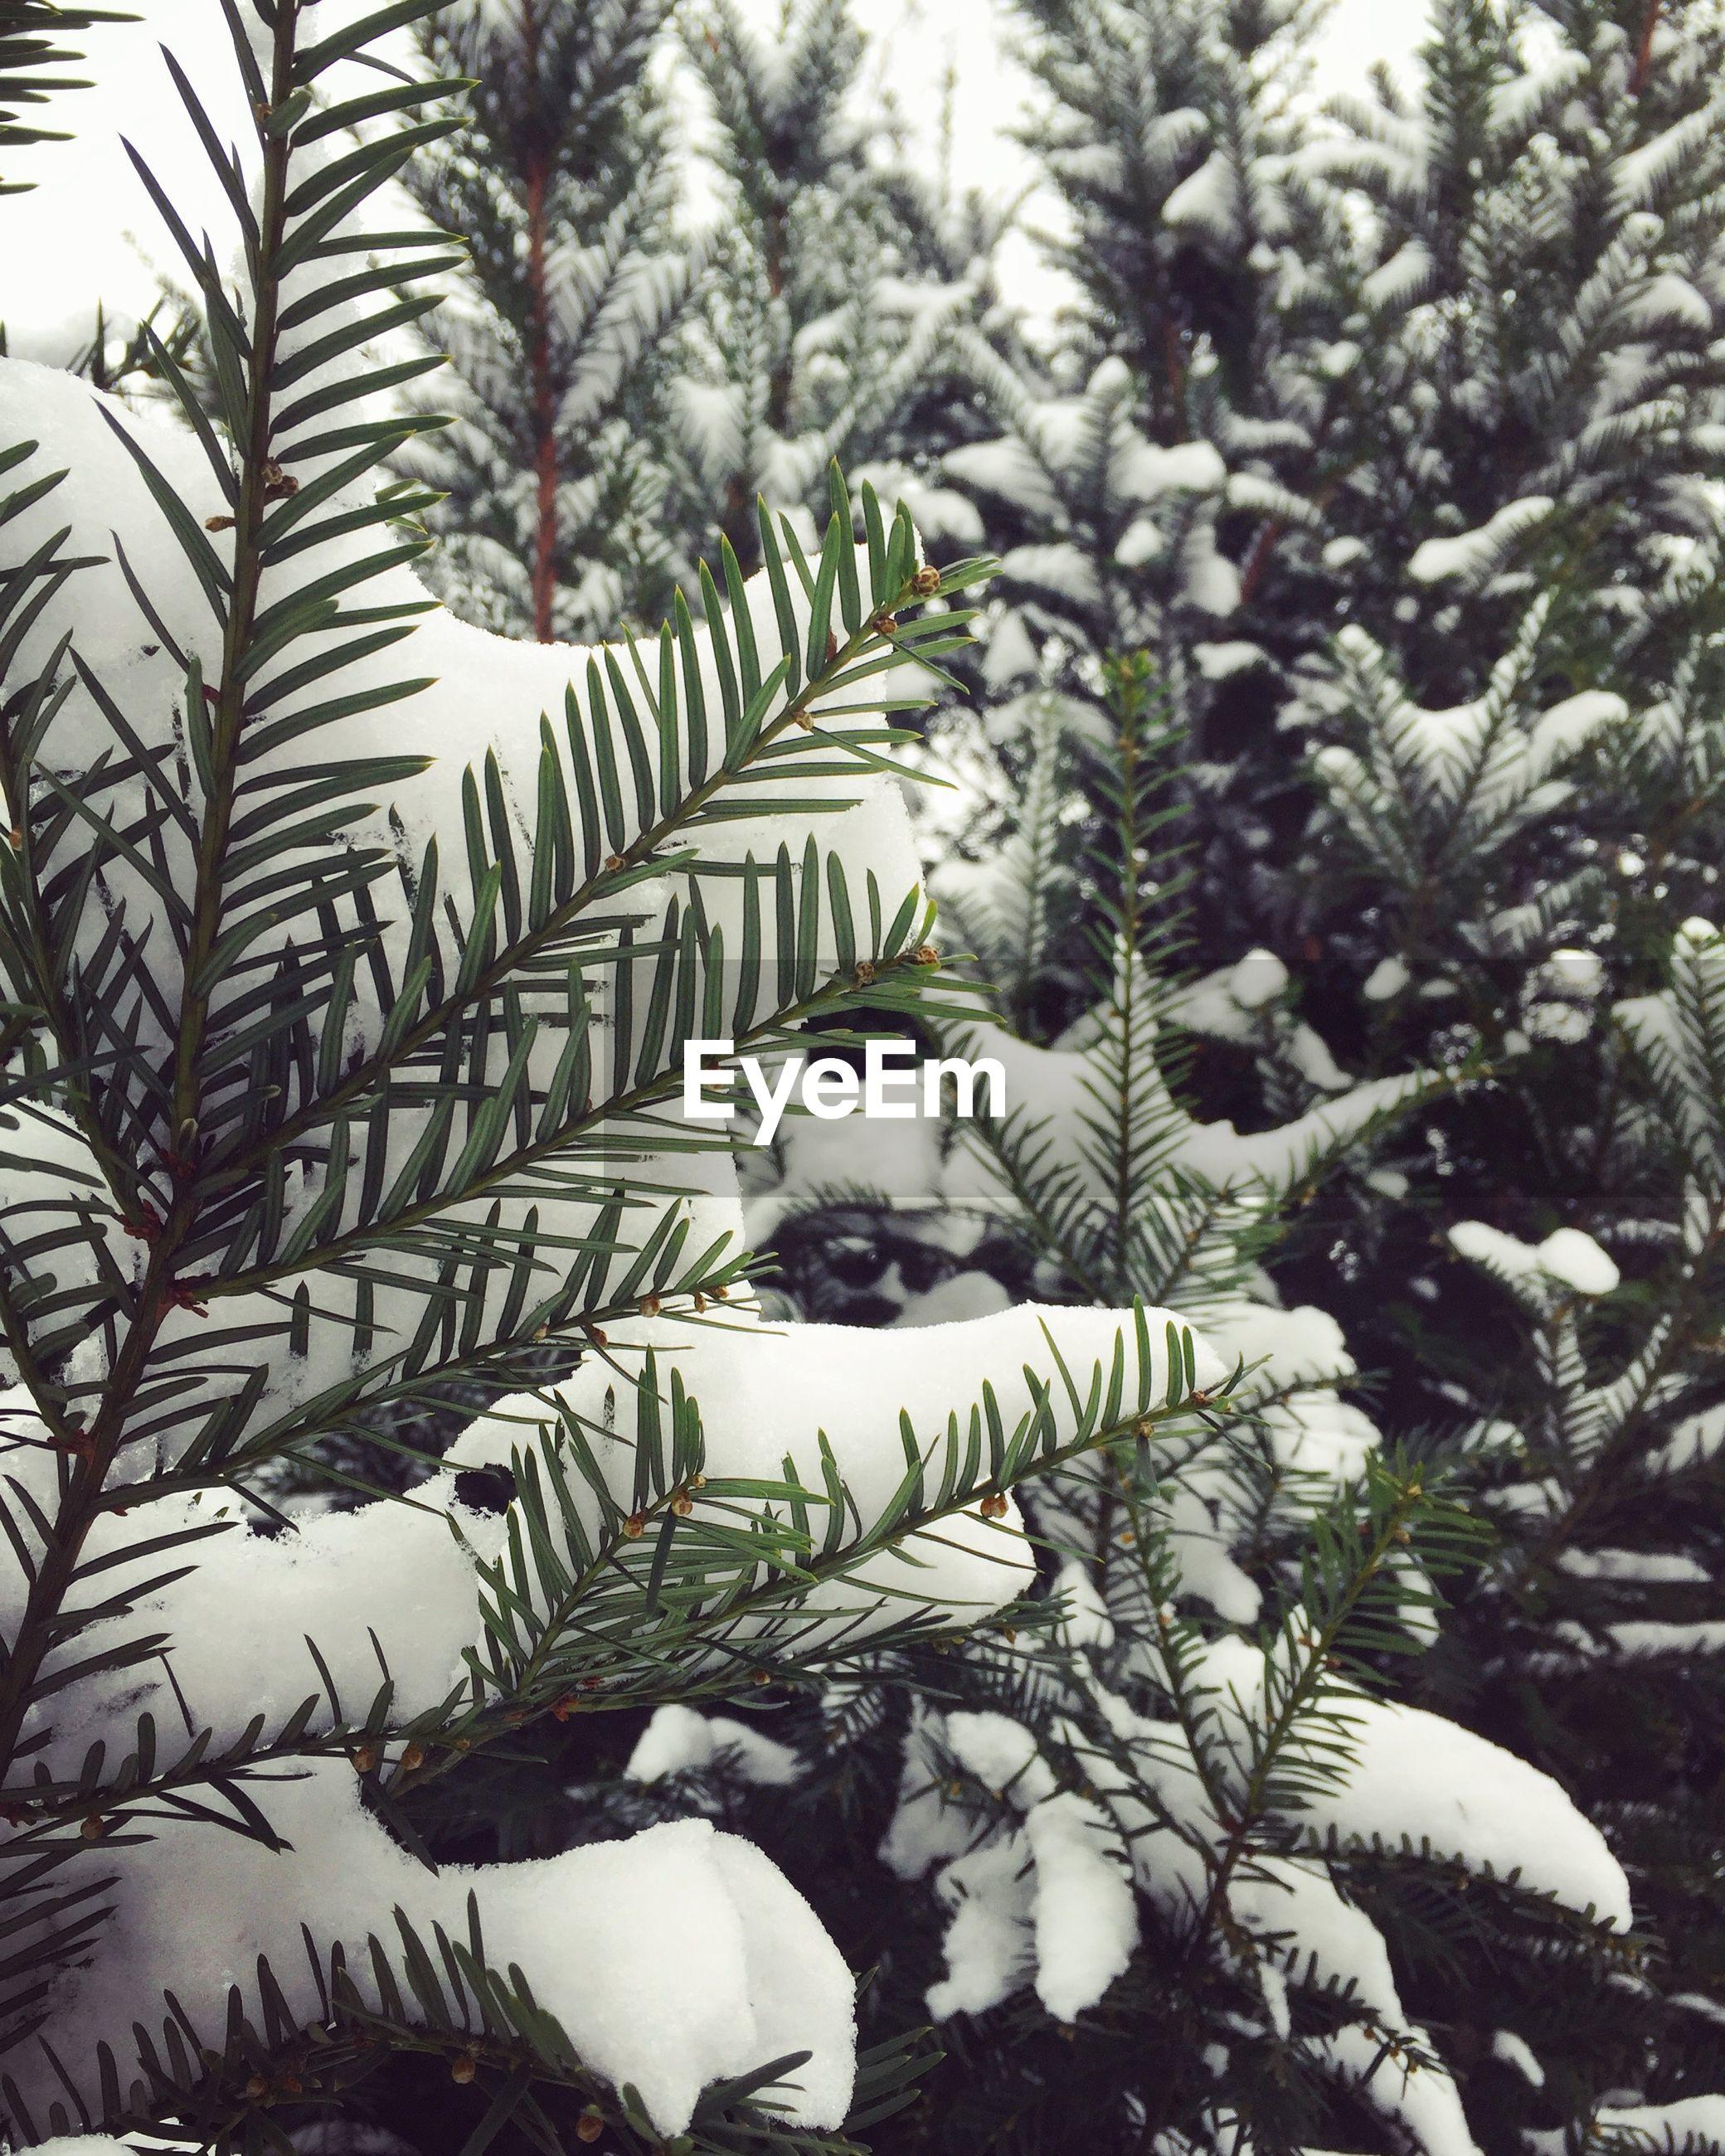 Frozen plants during winter